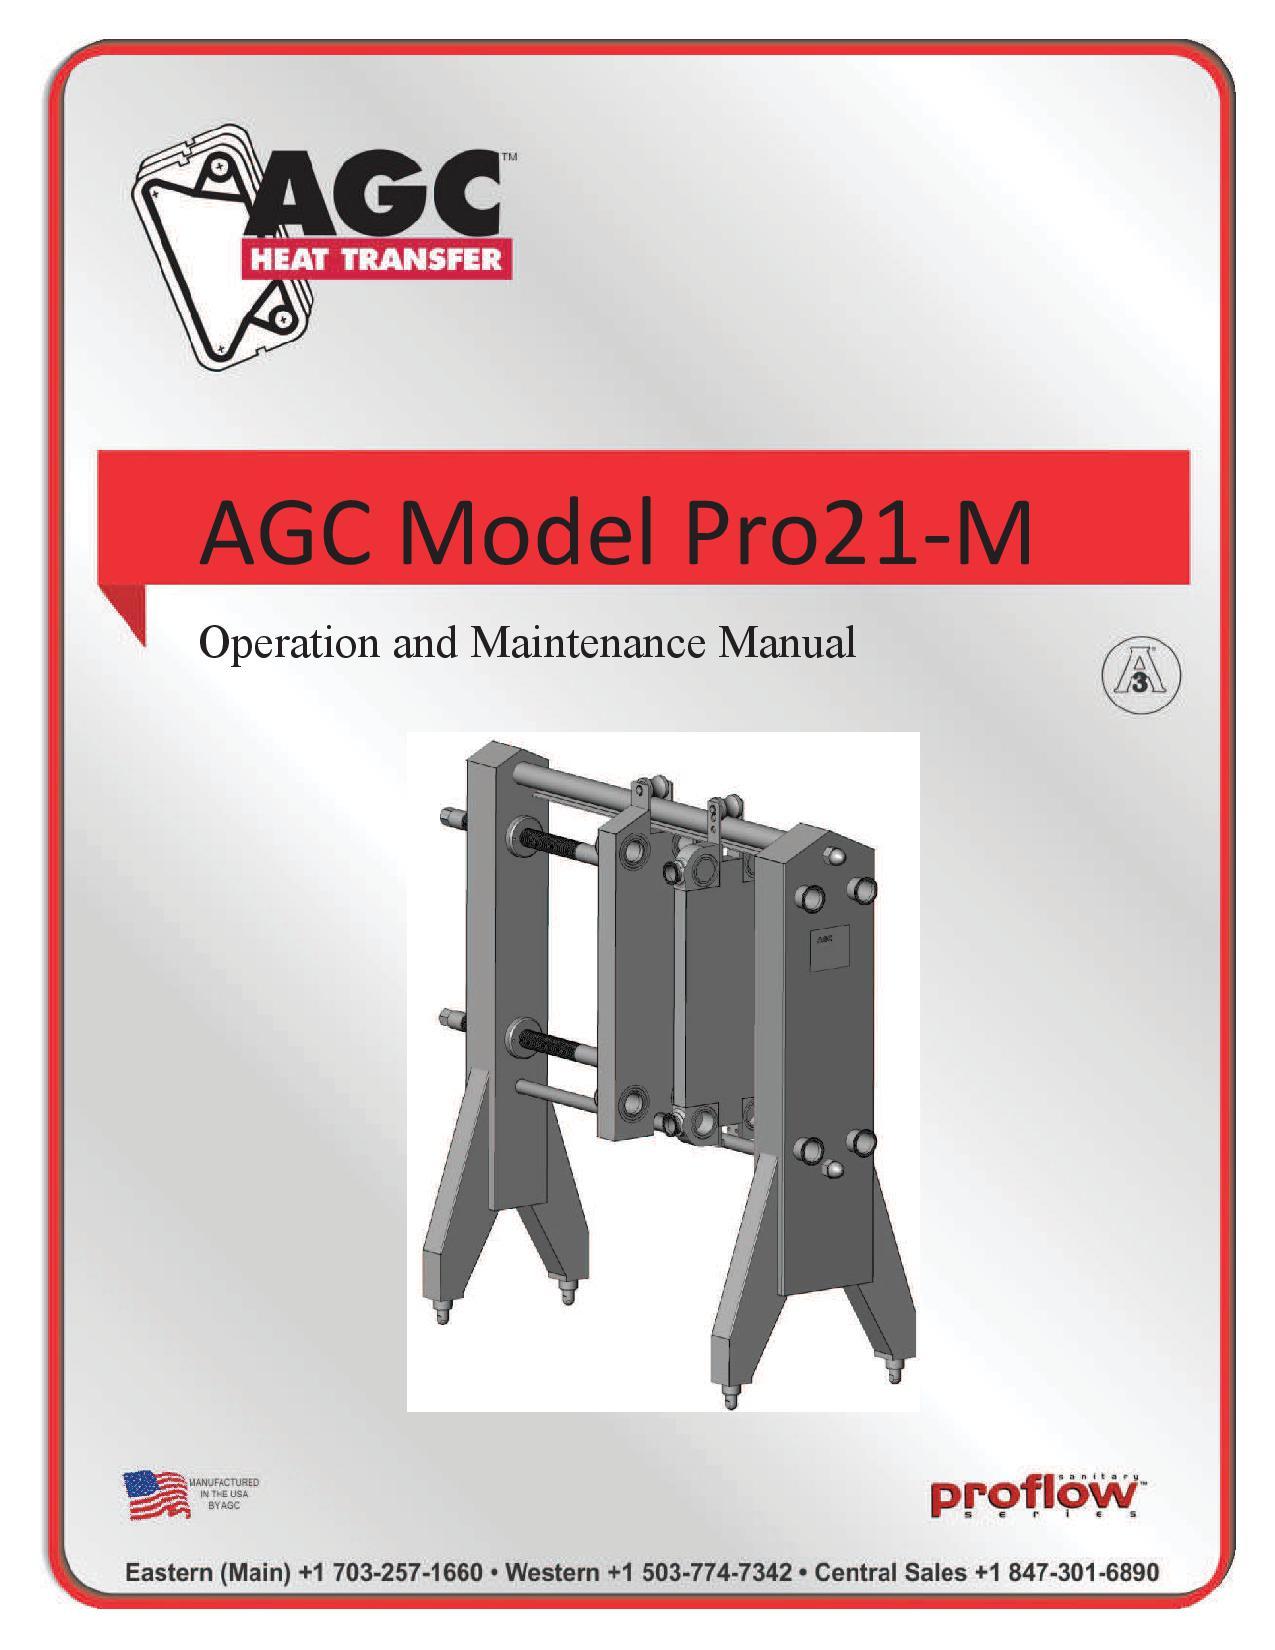 PRO21-M OPERATION MANUAL